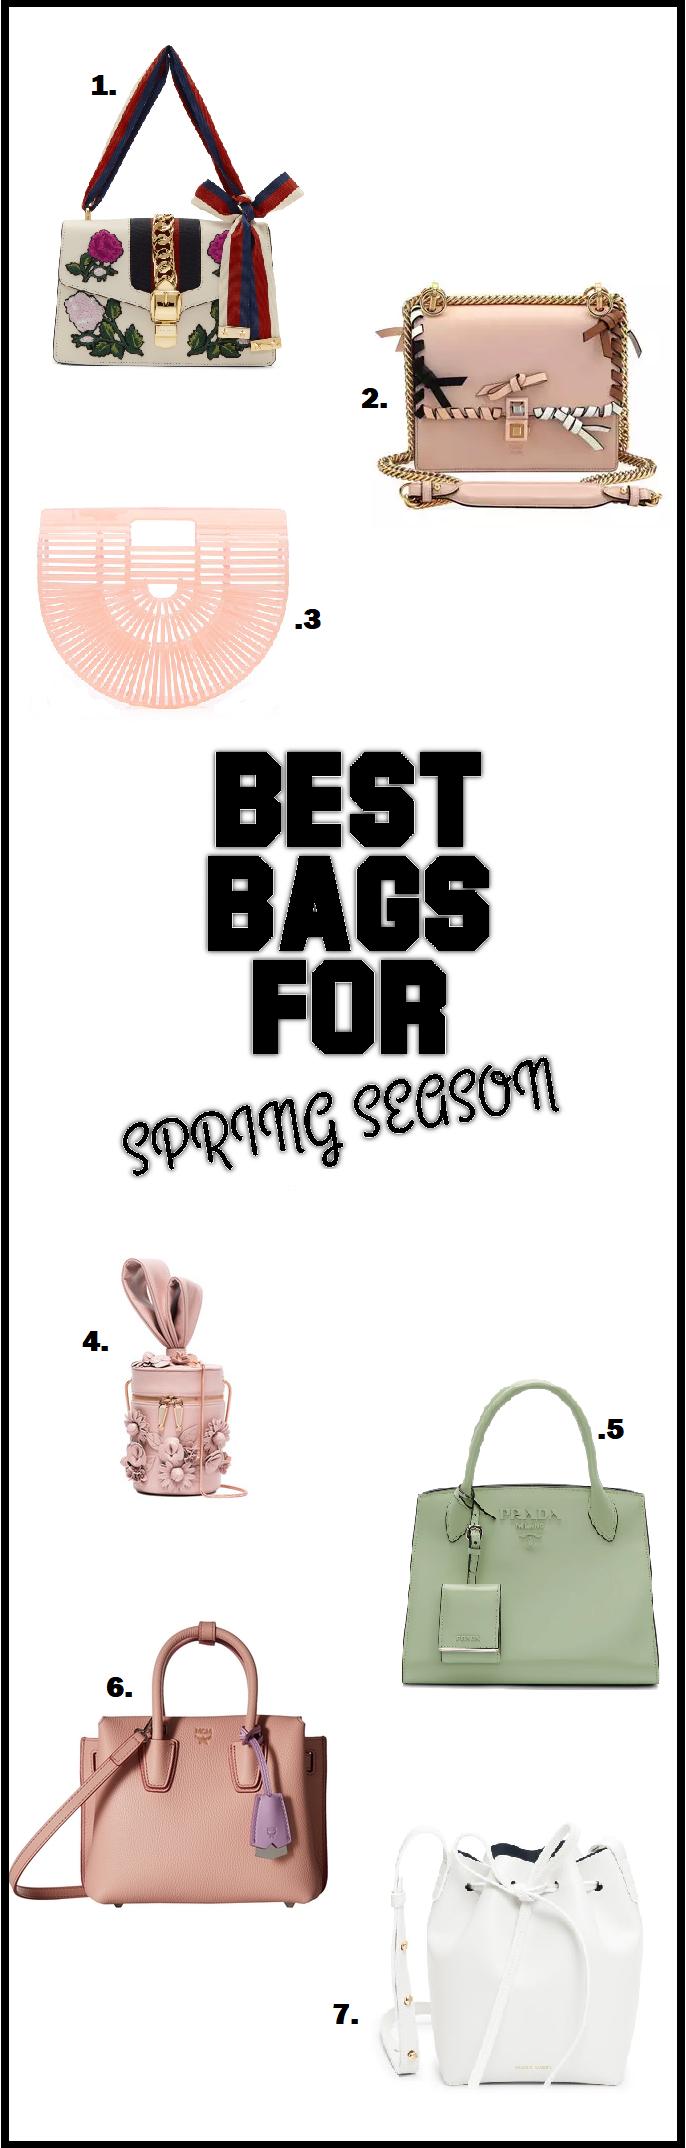 springbags.png